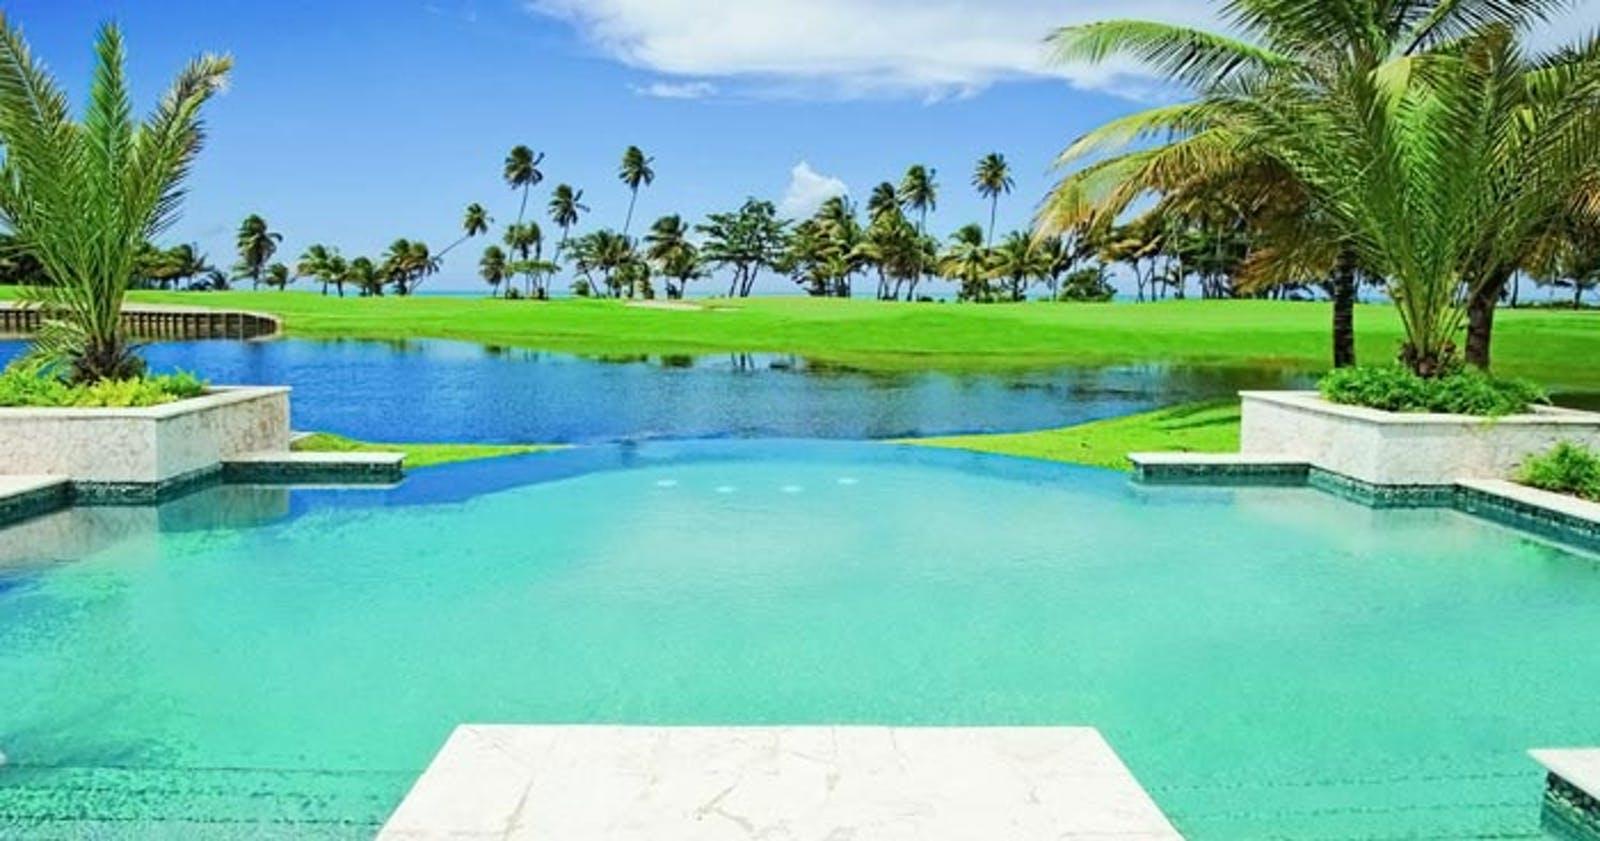 2 12 The St Regis Bahia Beach Resort Puerto Rico